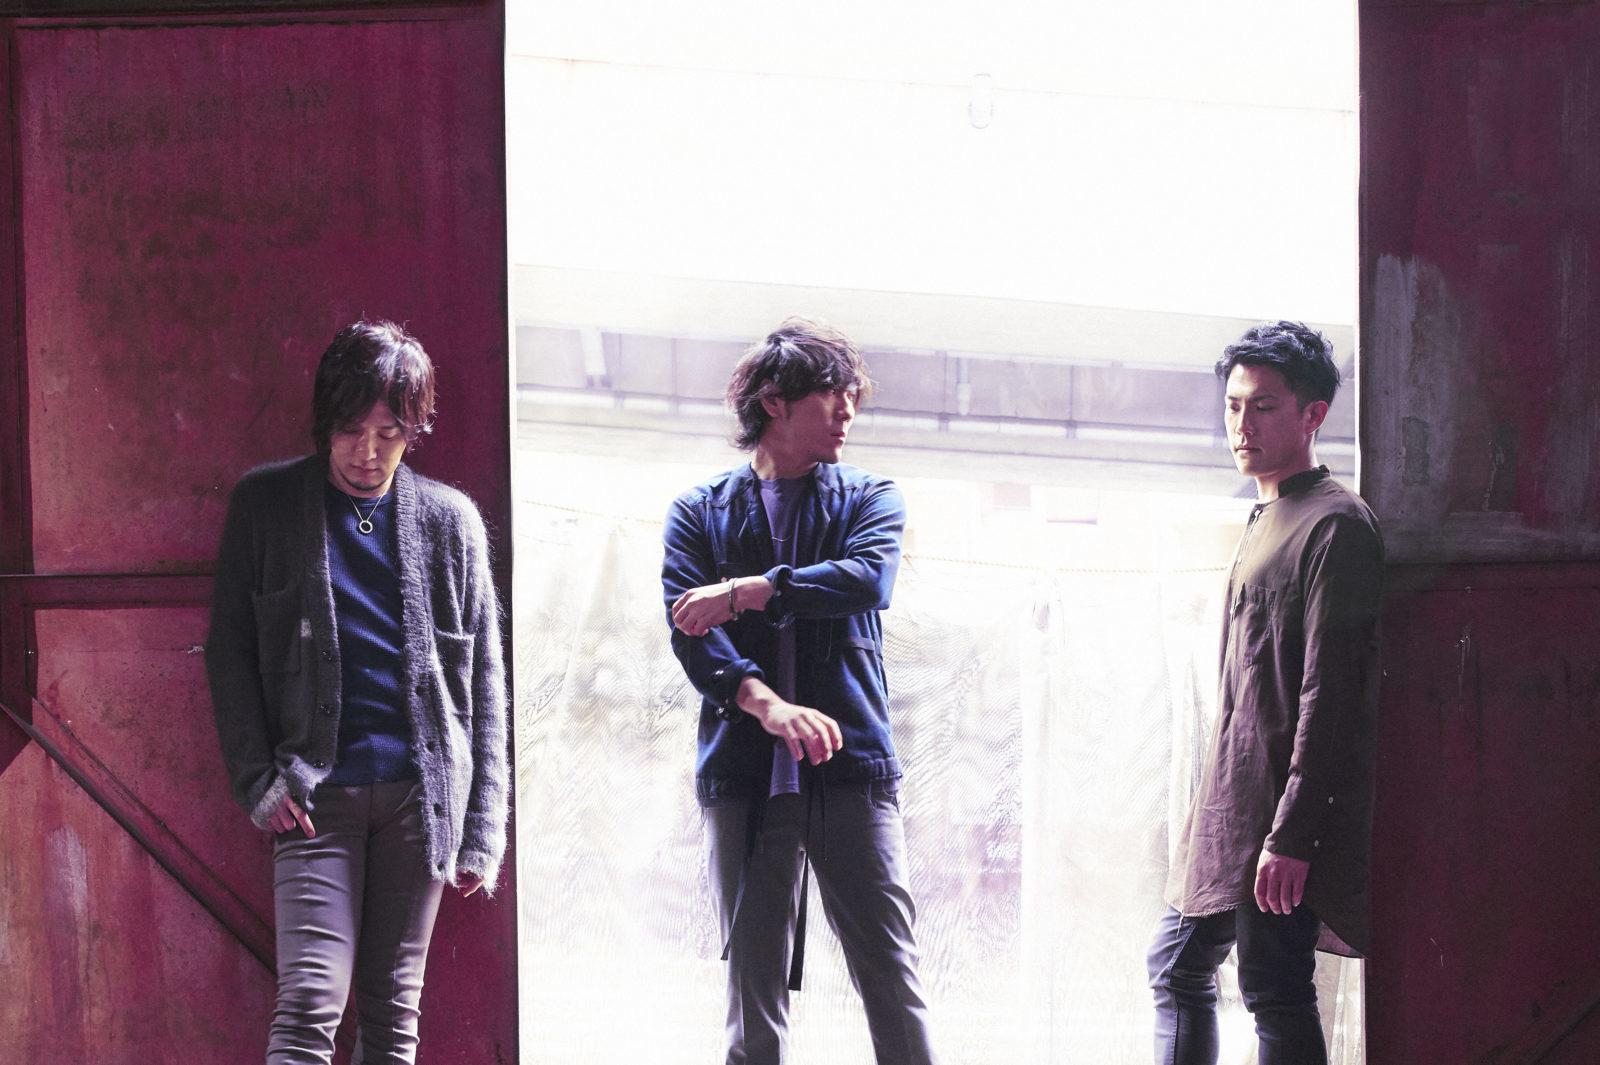 D-LITE(from BIGBANG)は3曲同時ランクイン!ディーン・フジオカも名を連ねる今注目の歌詞ランキング1位は、佐藤健×土屋太鳳の出演映画主題歌サムネイル画像